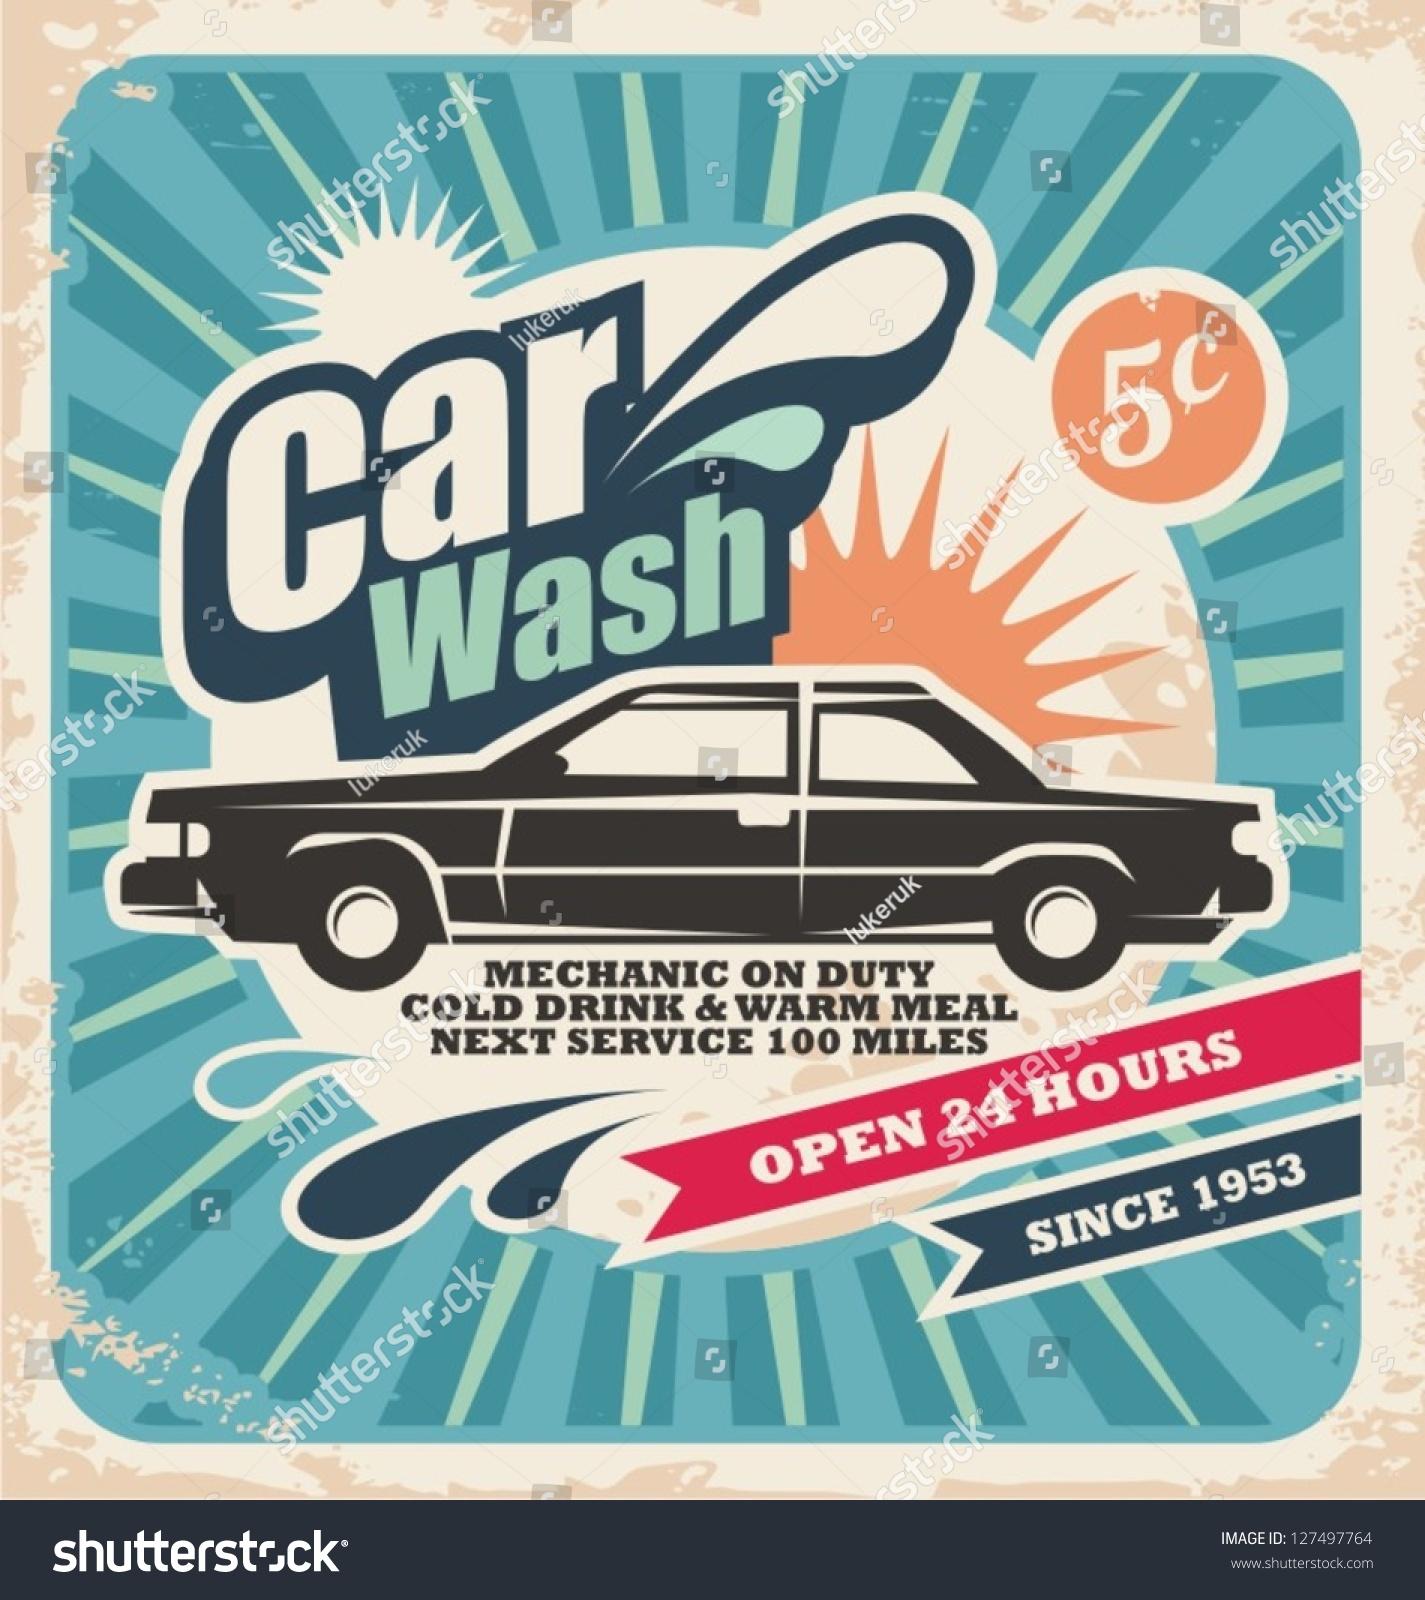 Vector Background Vintage Car Wash Service Stock Vector 127497764 ...